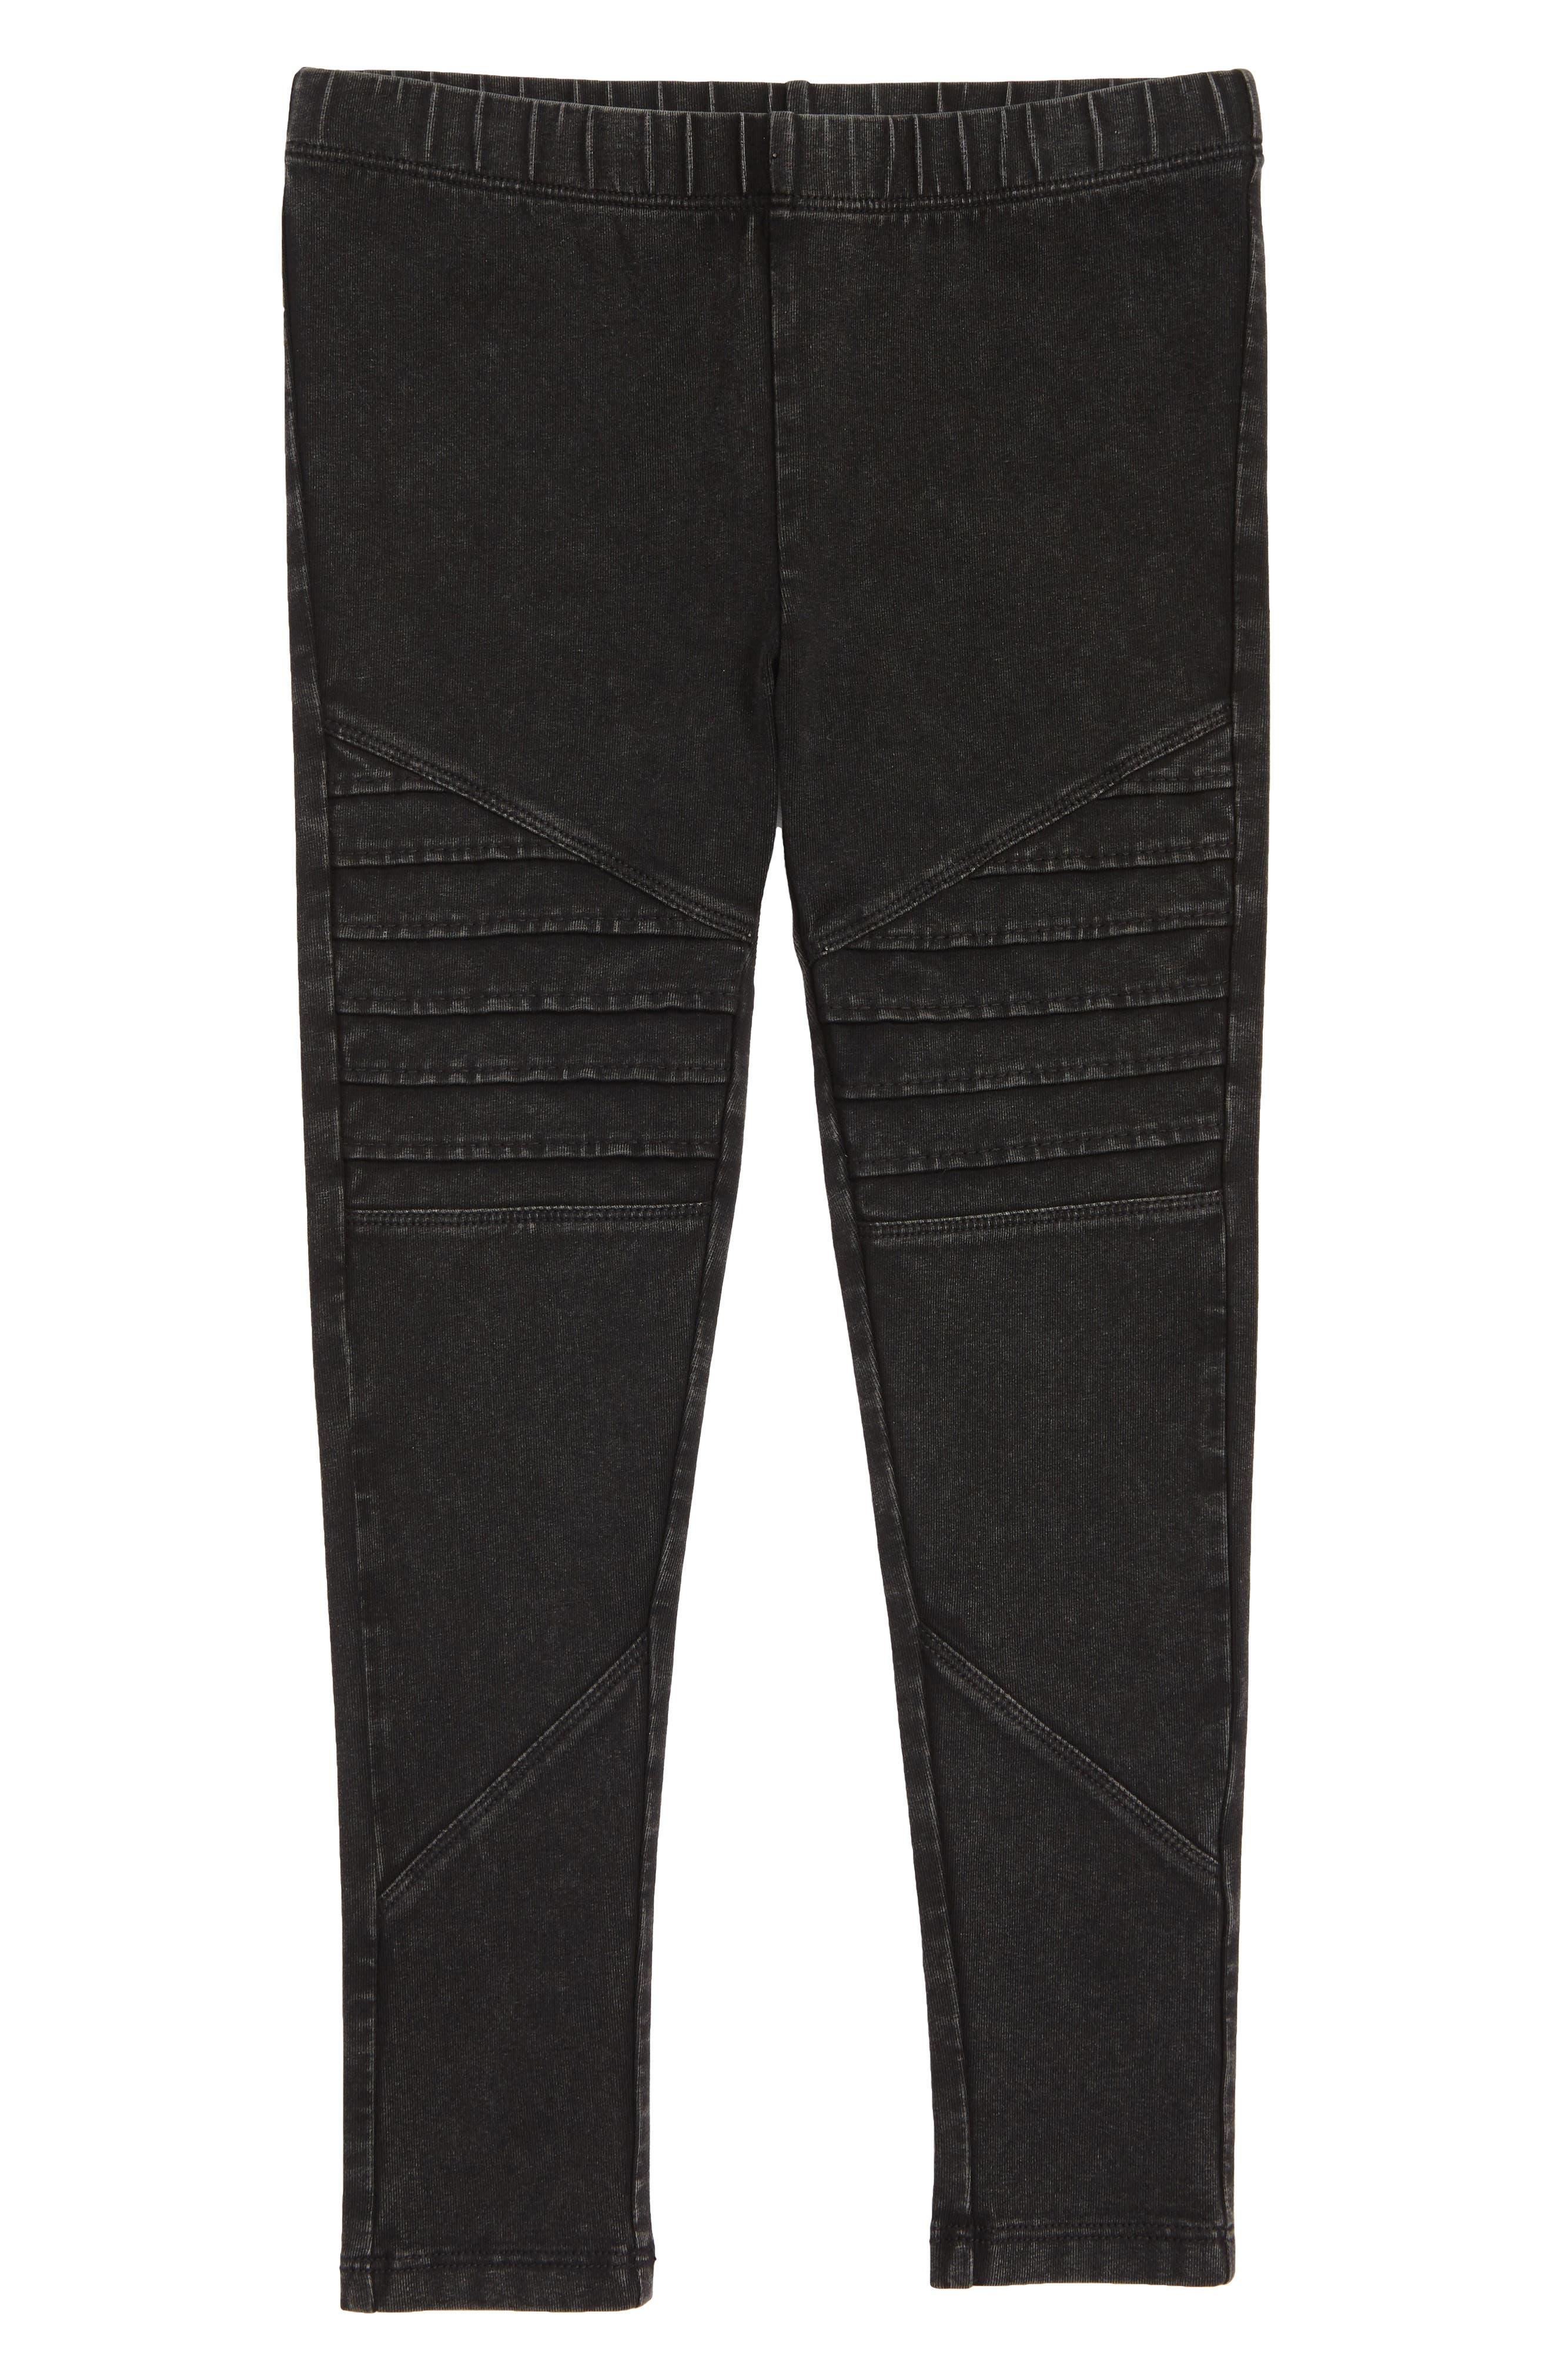 TUCKER + TATE, Stretch Cotton Moto Leggings, Main thumbnail 1, color, BLACK ROCK WASH